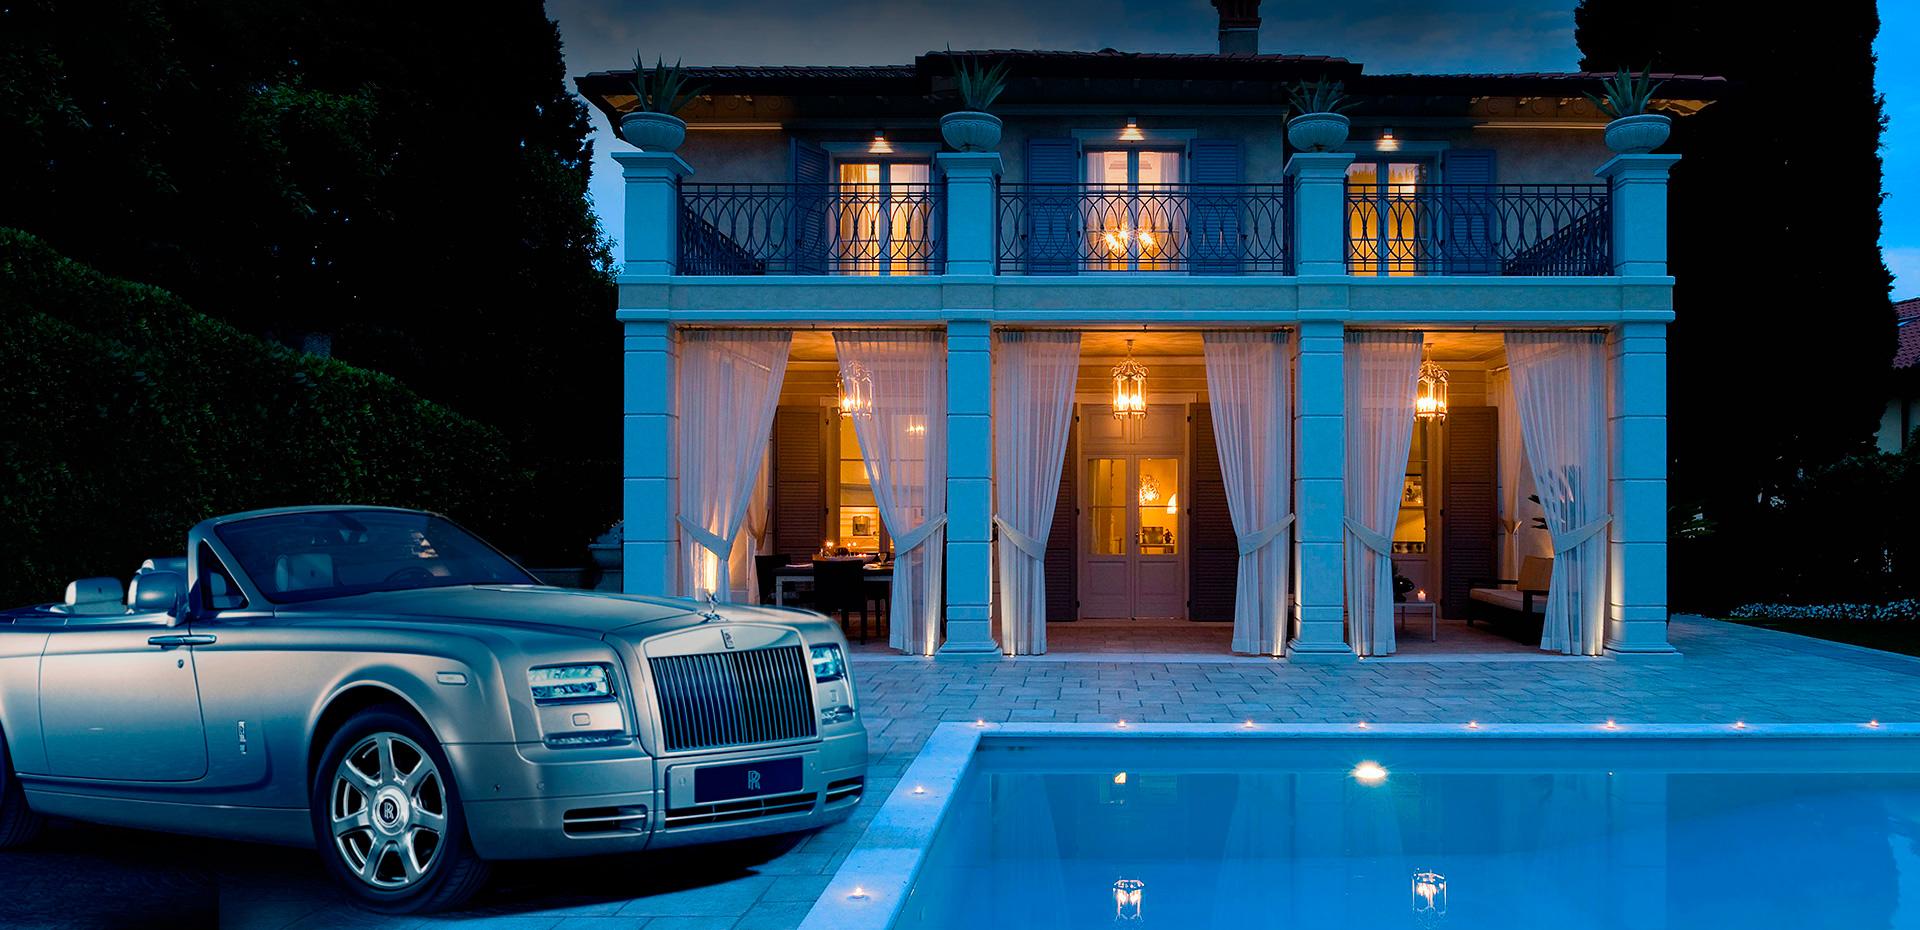 Luxury Villas - ЖИЛЬЕ В ГАРДА - ИТАЛИЯ